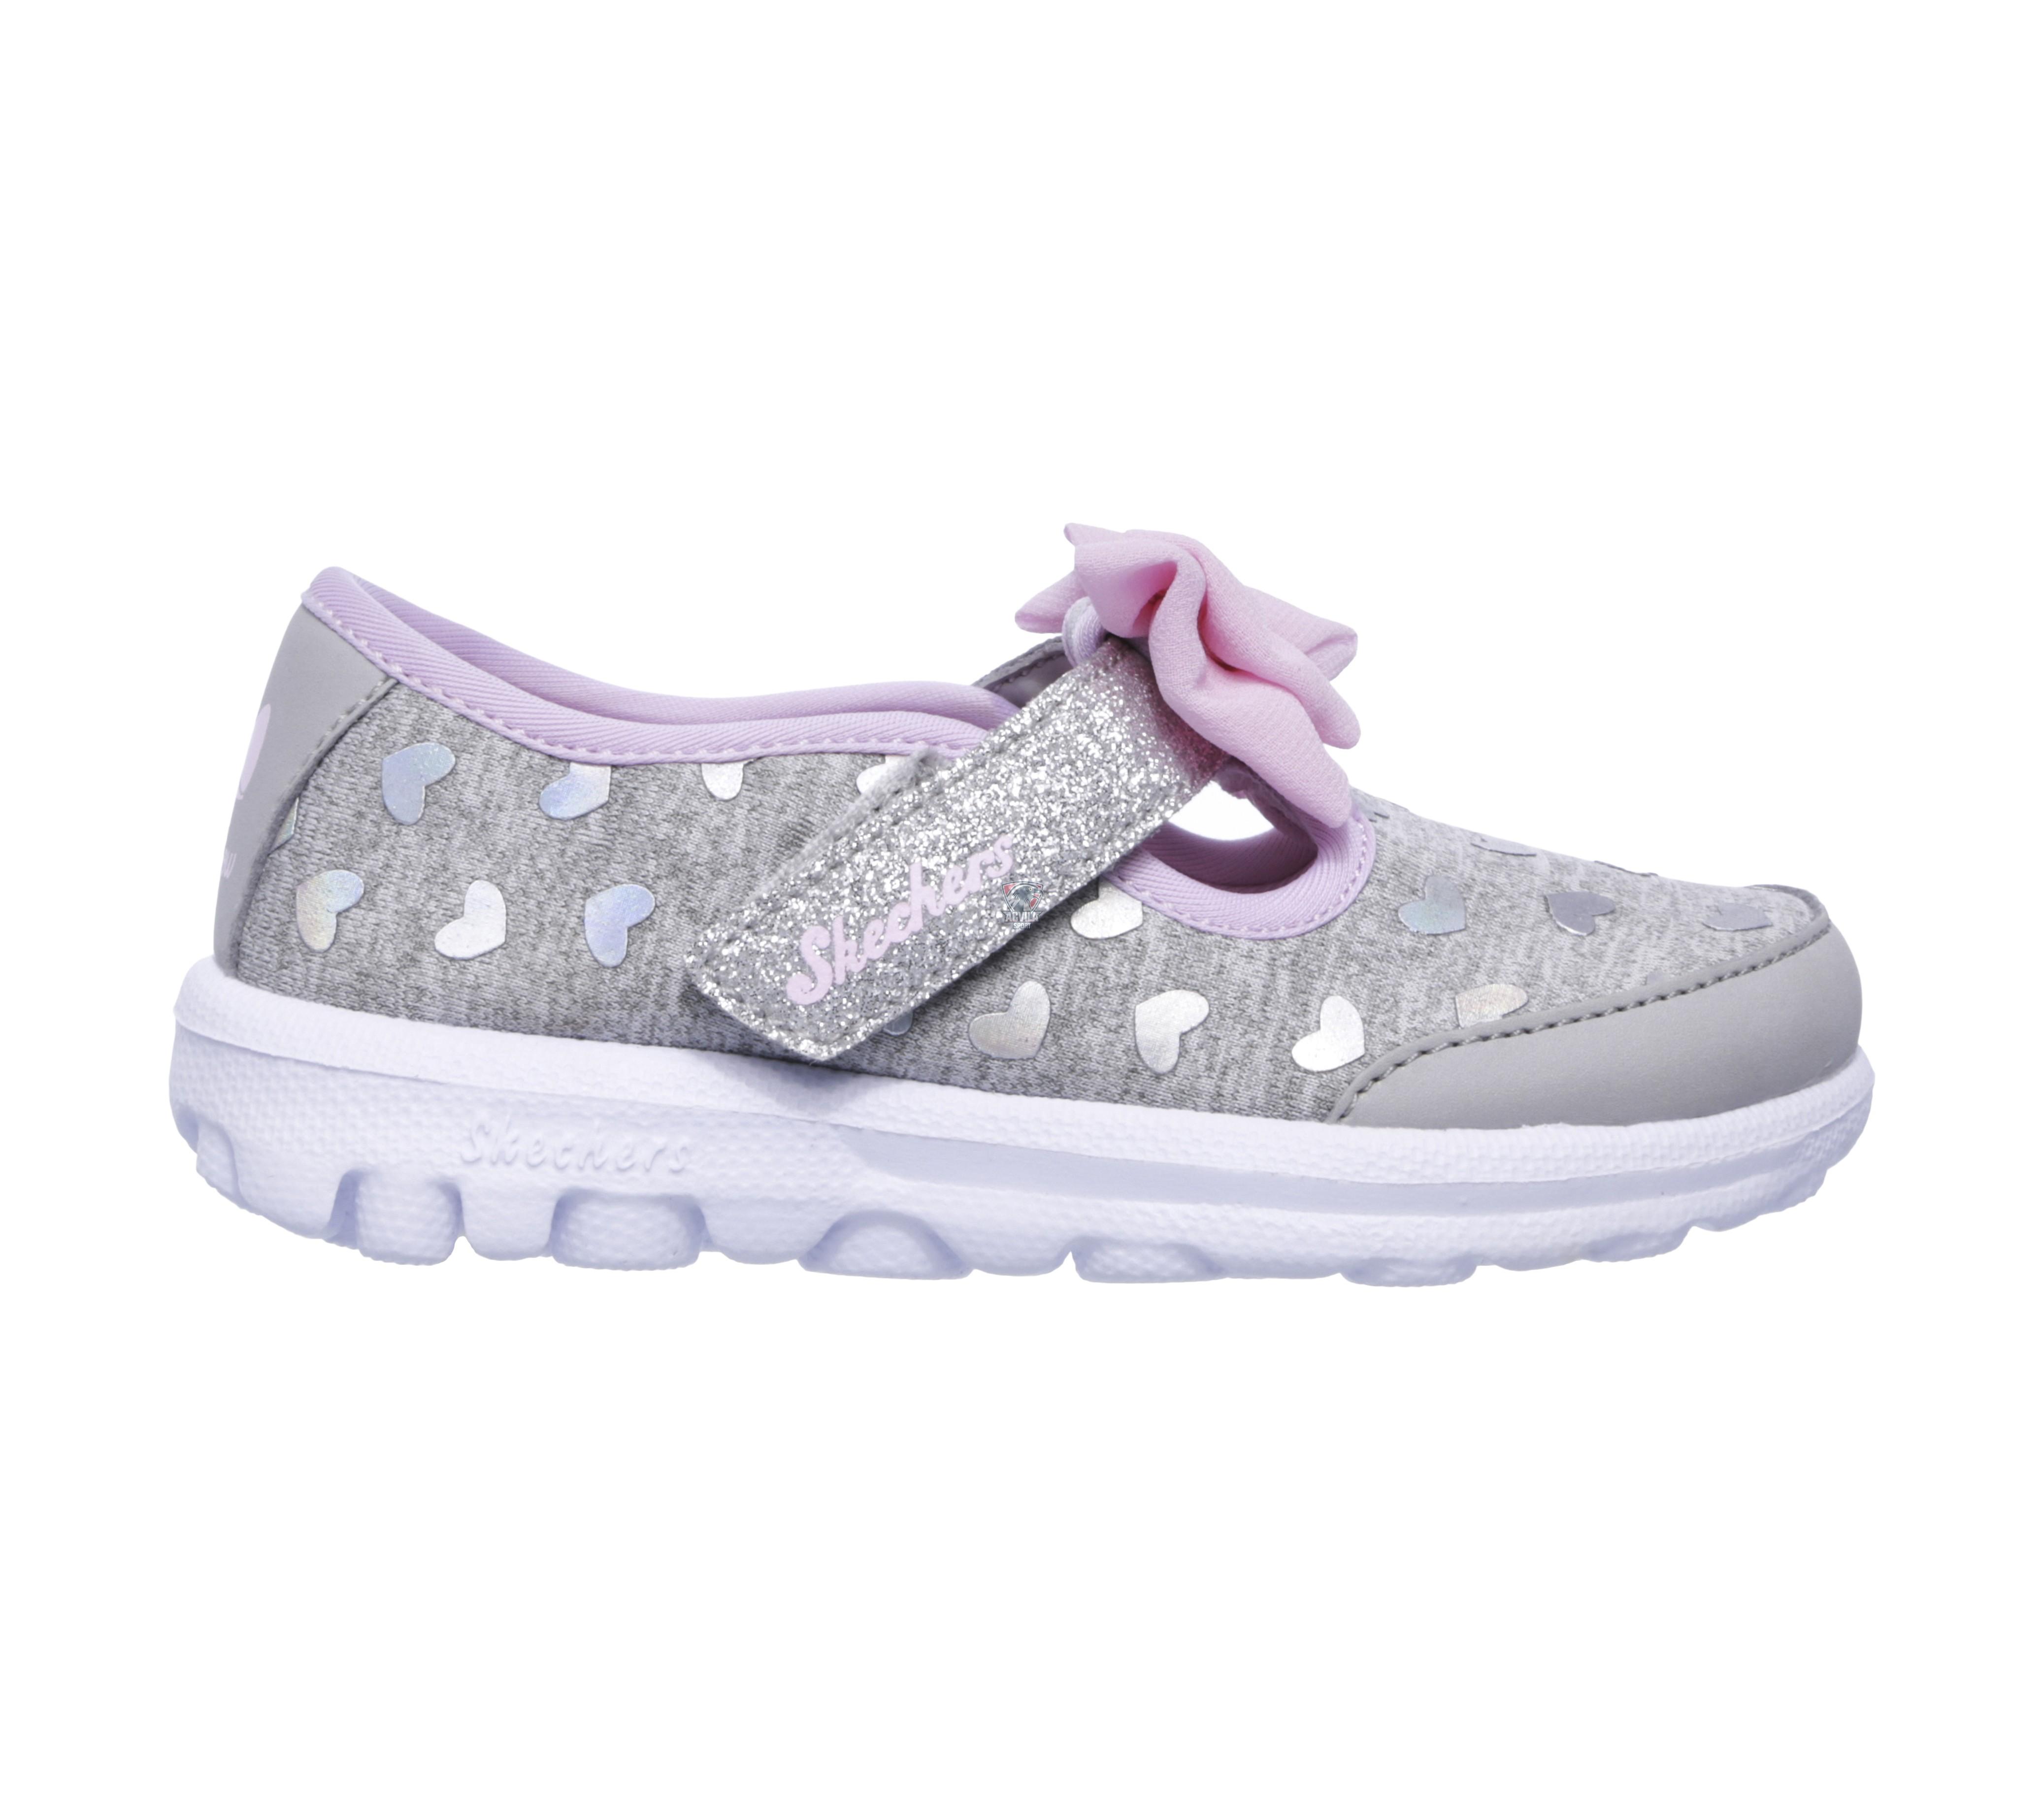 photo 8 Детская обувь SKECHERS DYNAMIGHT - LEAD RUNNER